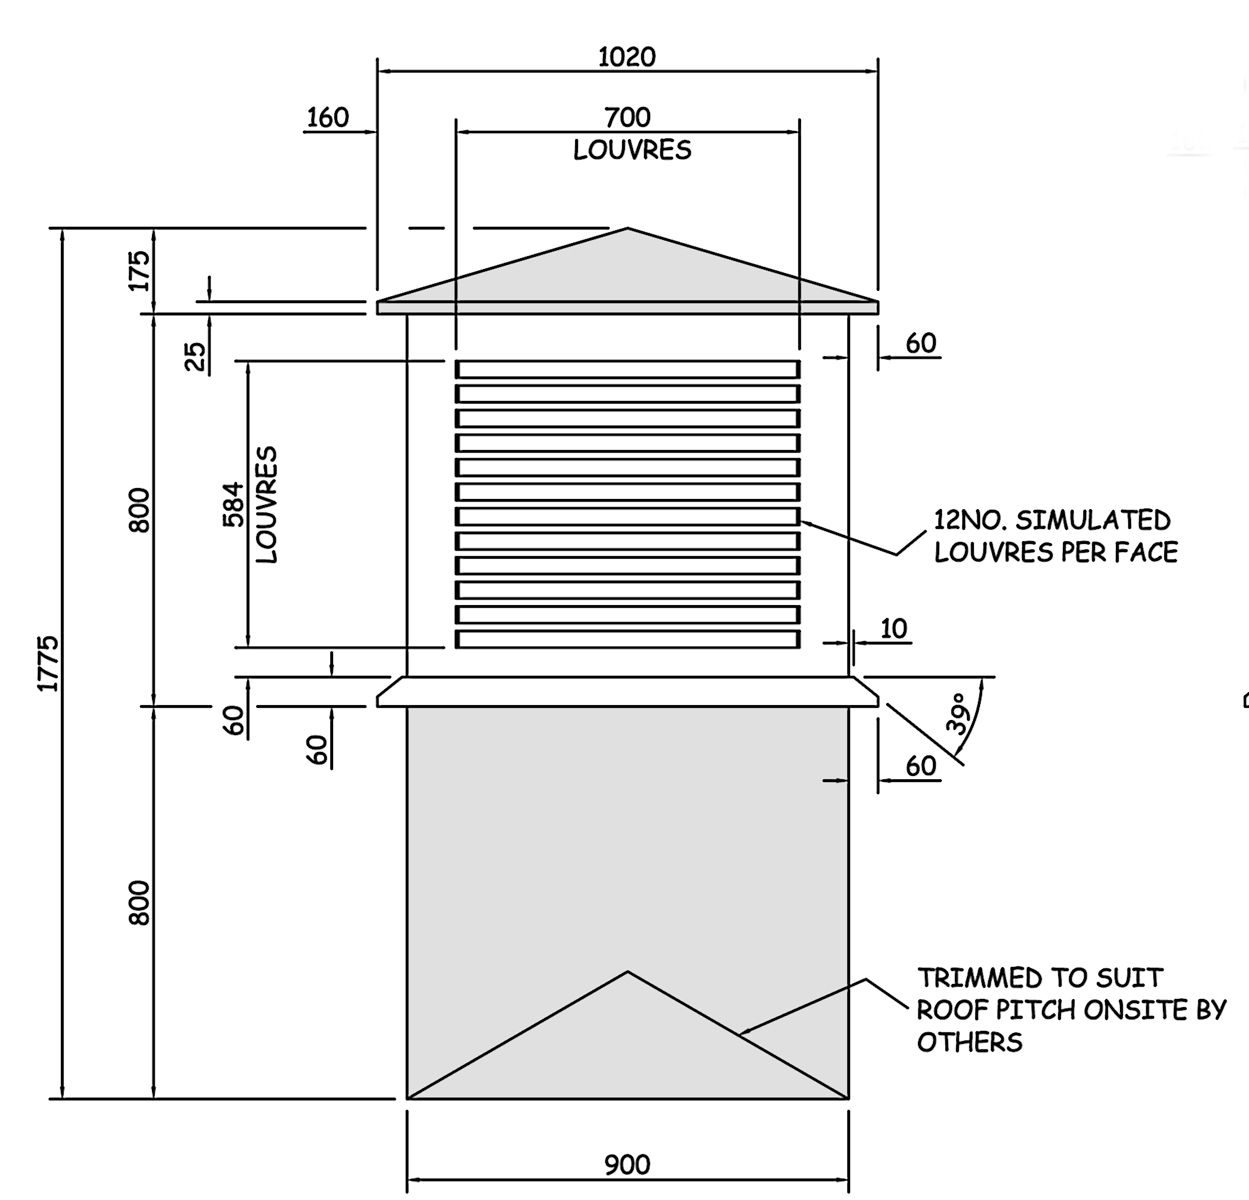 Fibreglass Roof Dovecotes And Turrets Grp Roofing Supplies Alero Engine Diagram Wbp 70106 Dovecote